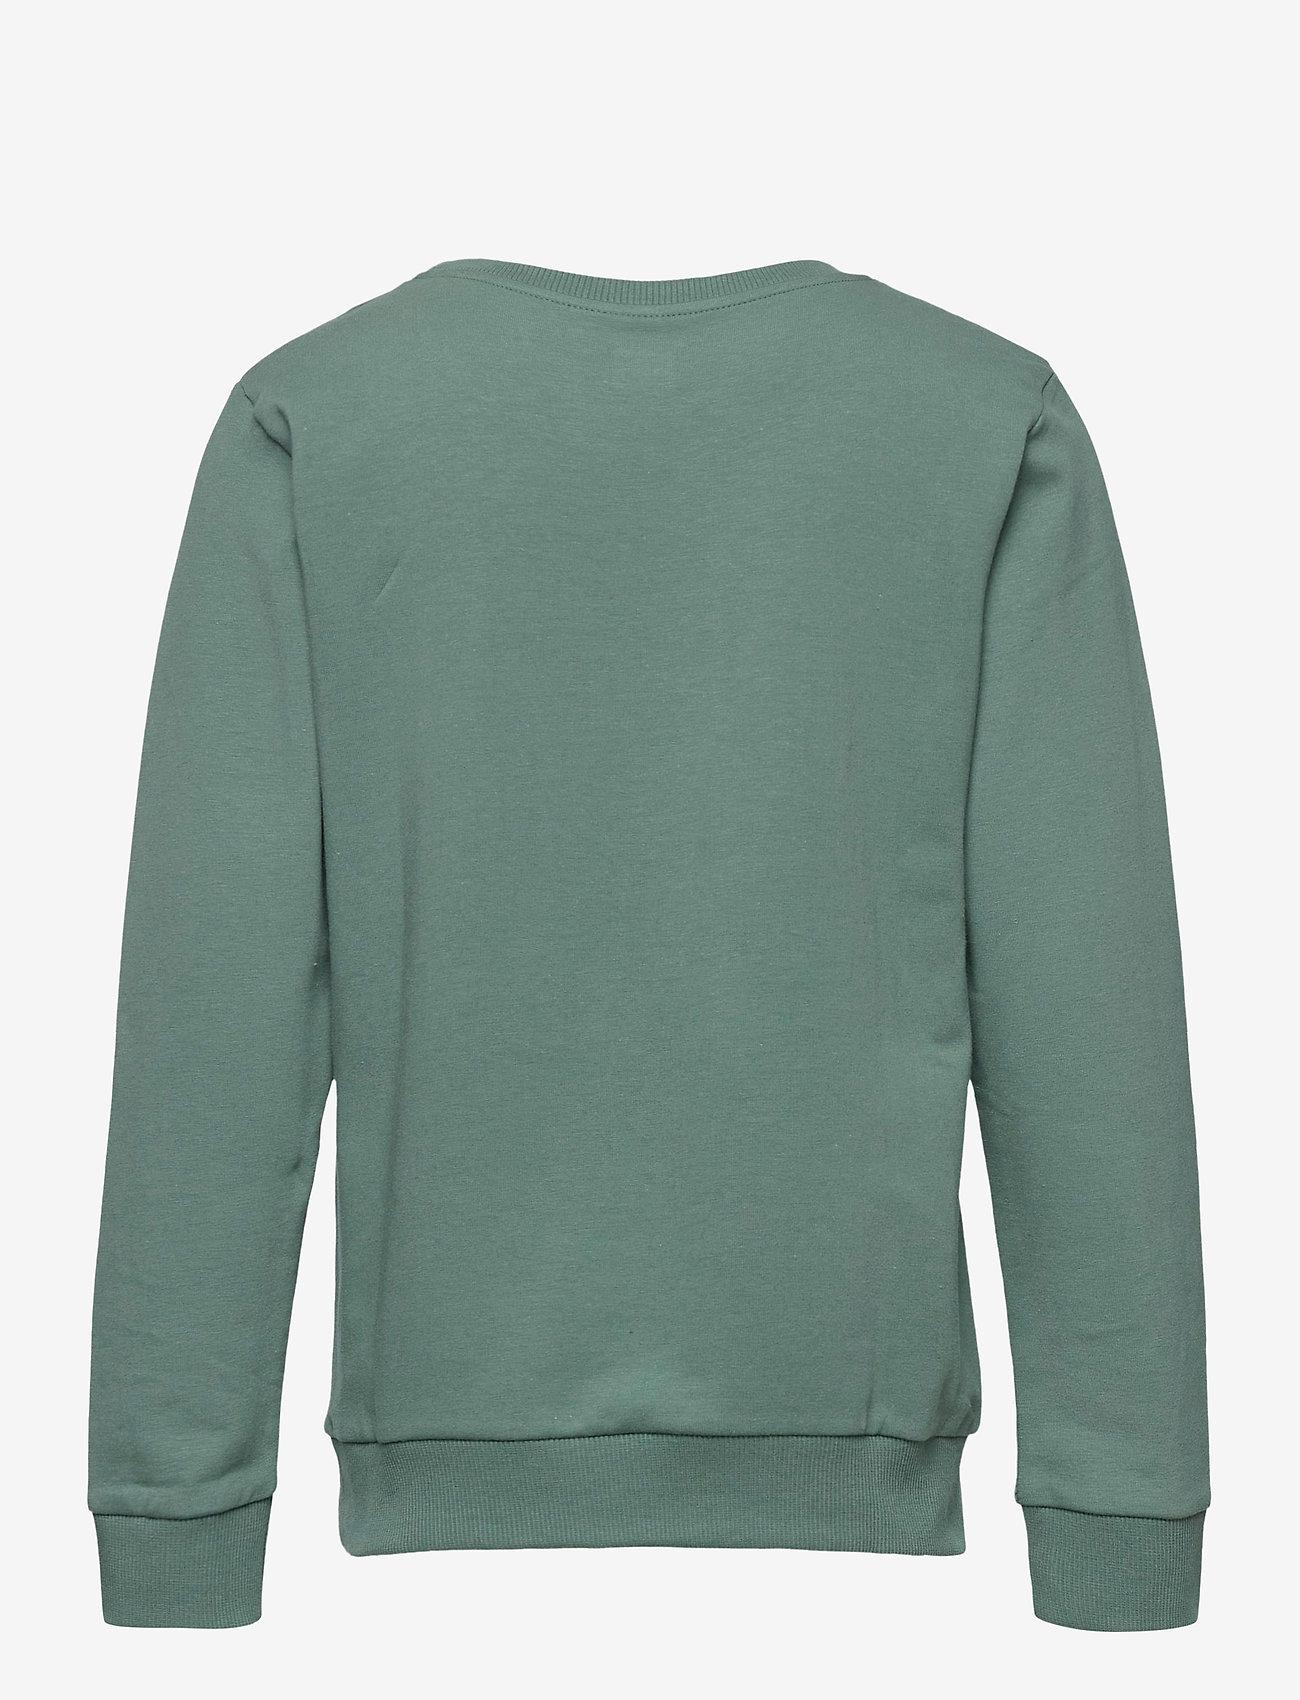 Lego wear - M12010054 - SWEATSHIRT - sweatshirts - mat green - 1